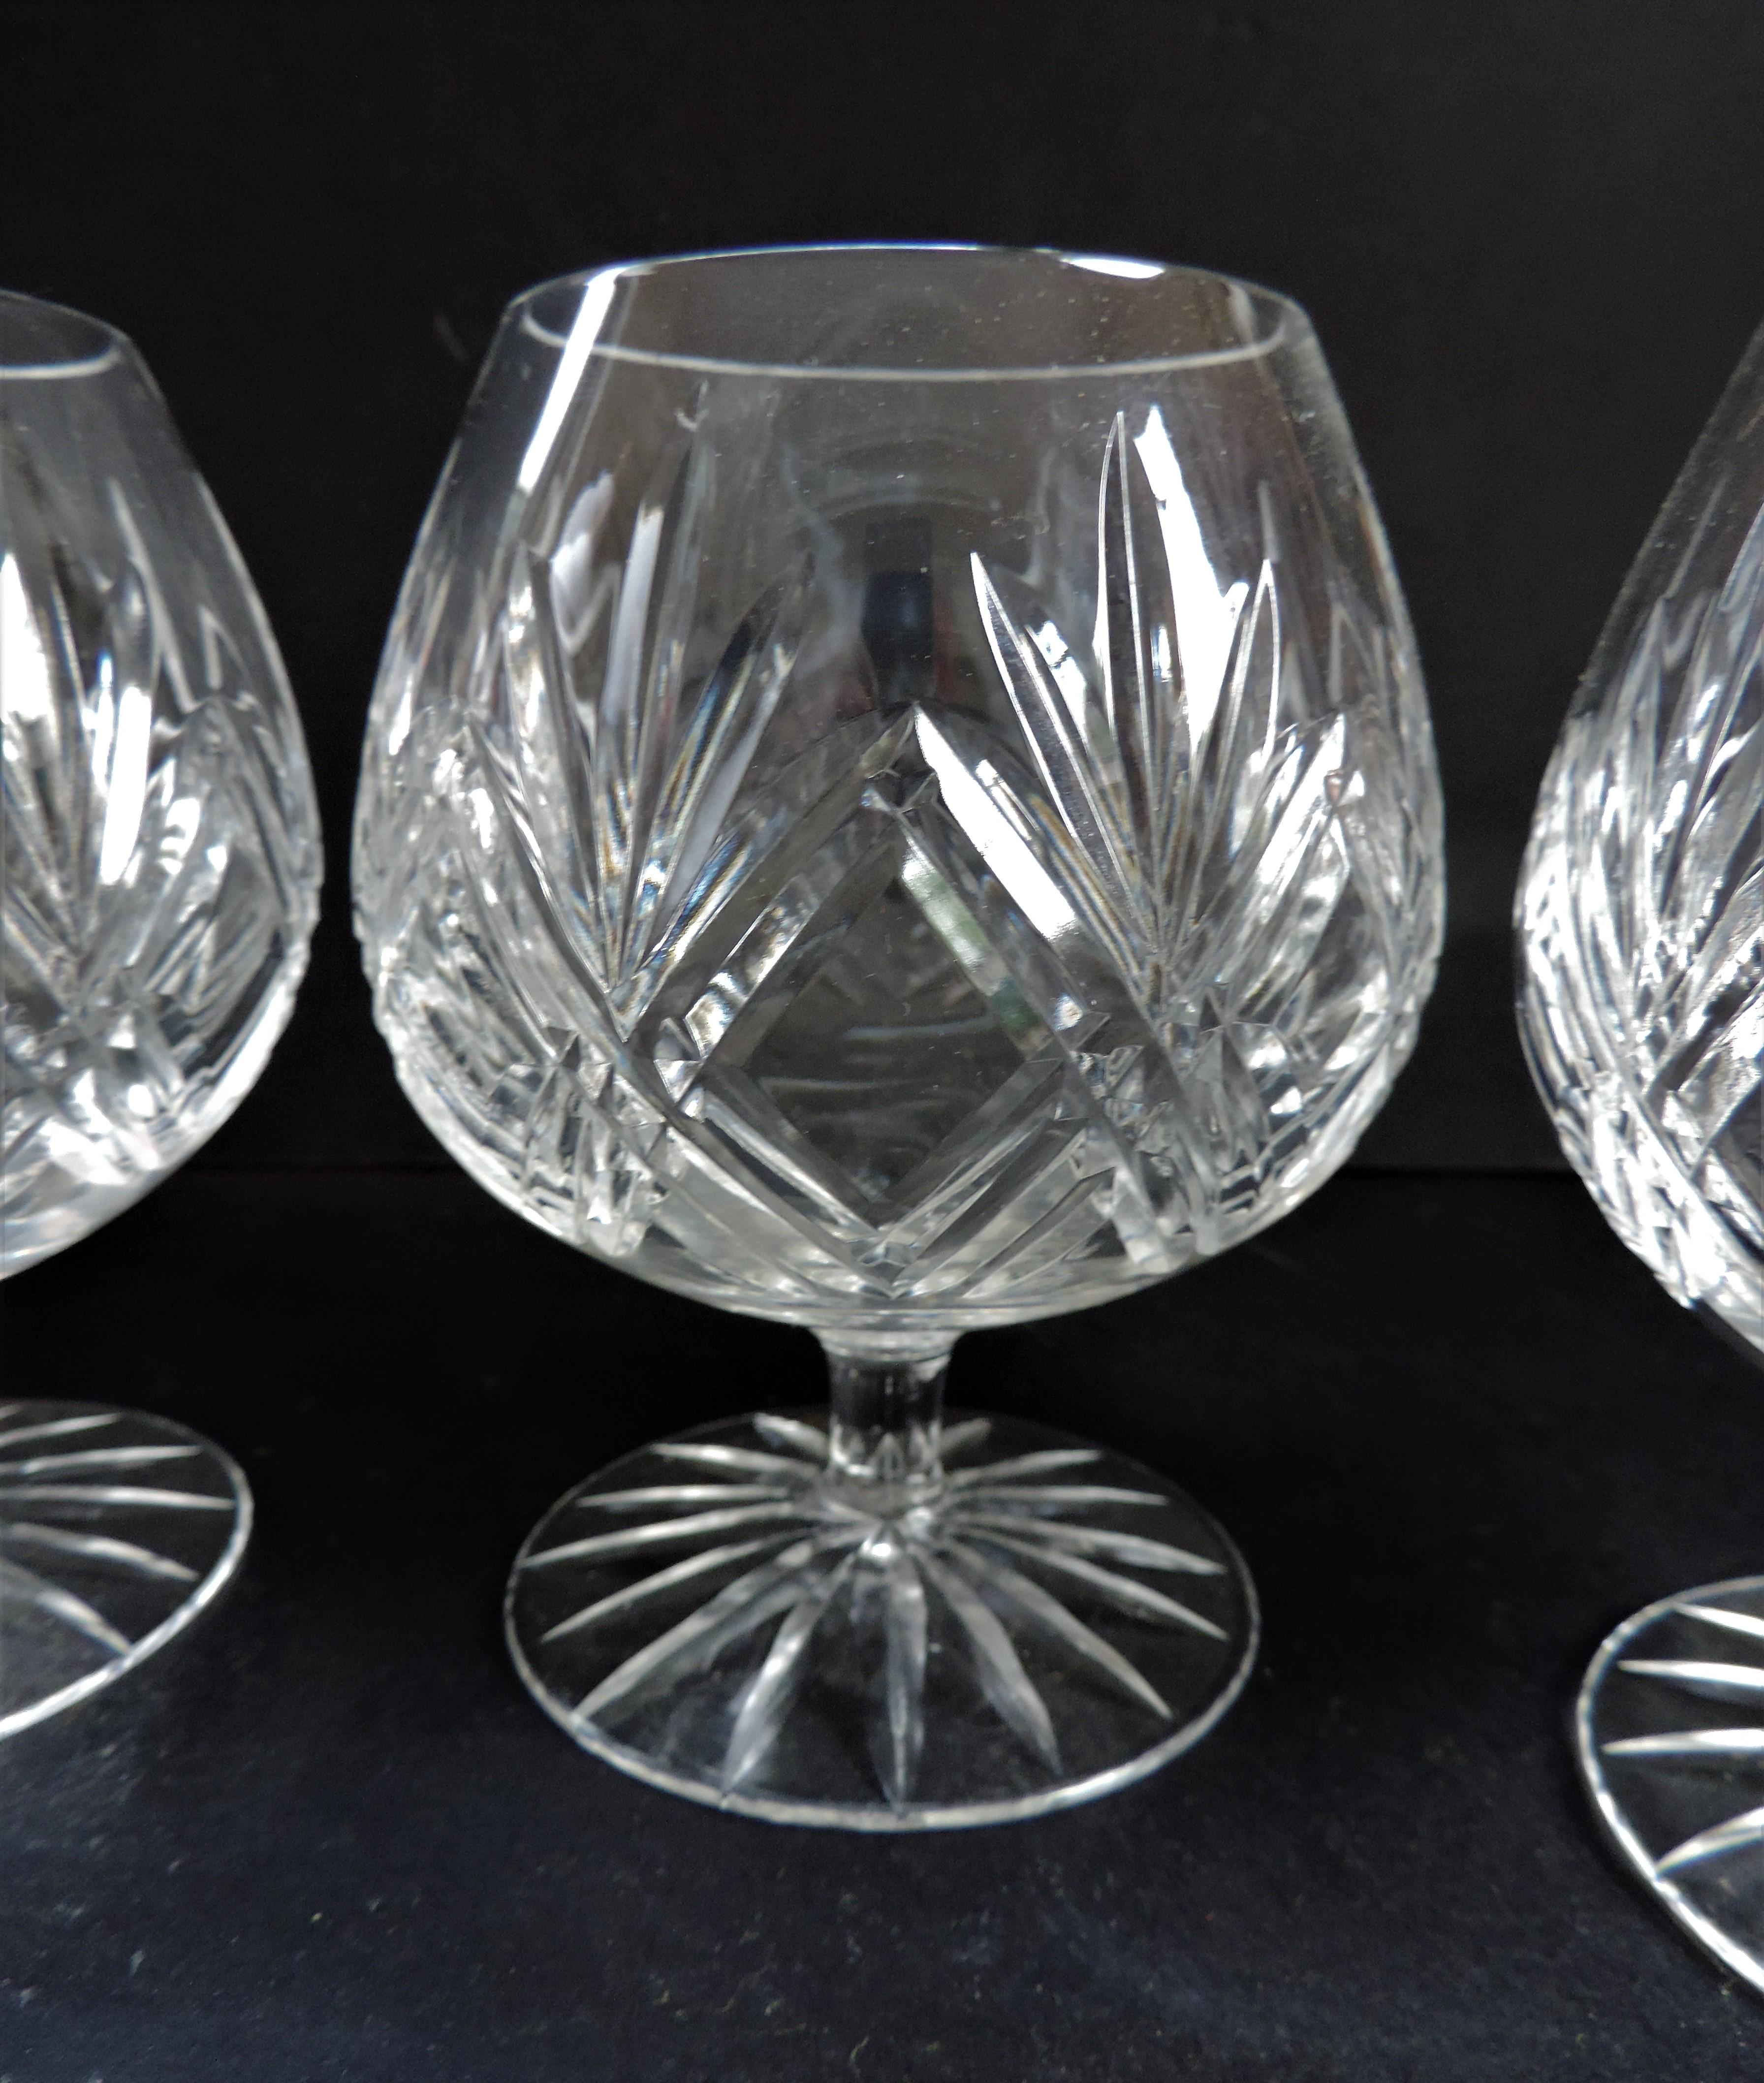 Set 4 Crystal Brandy Glasses - Image 3 of 3